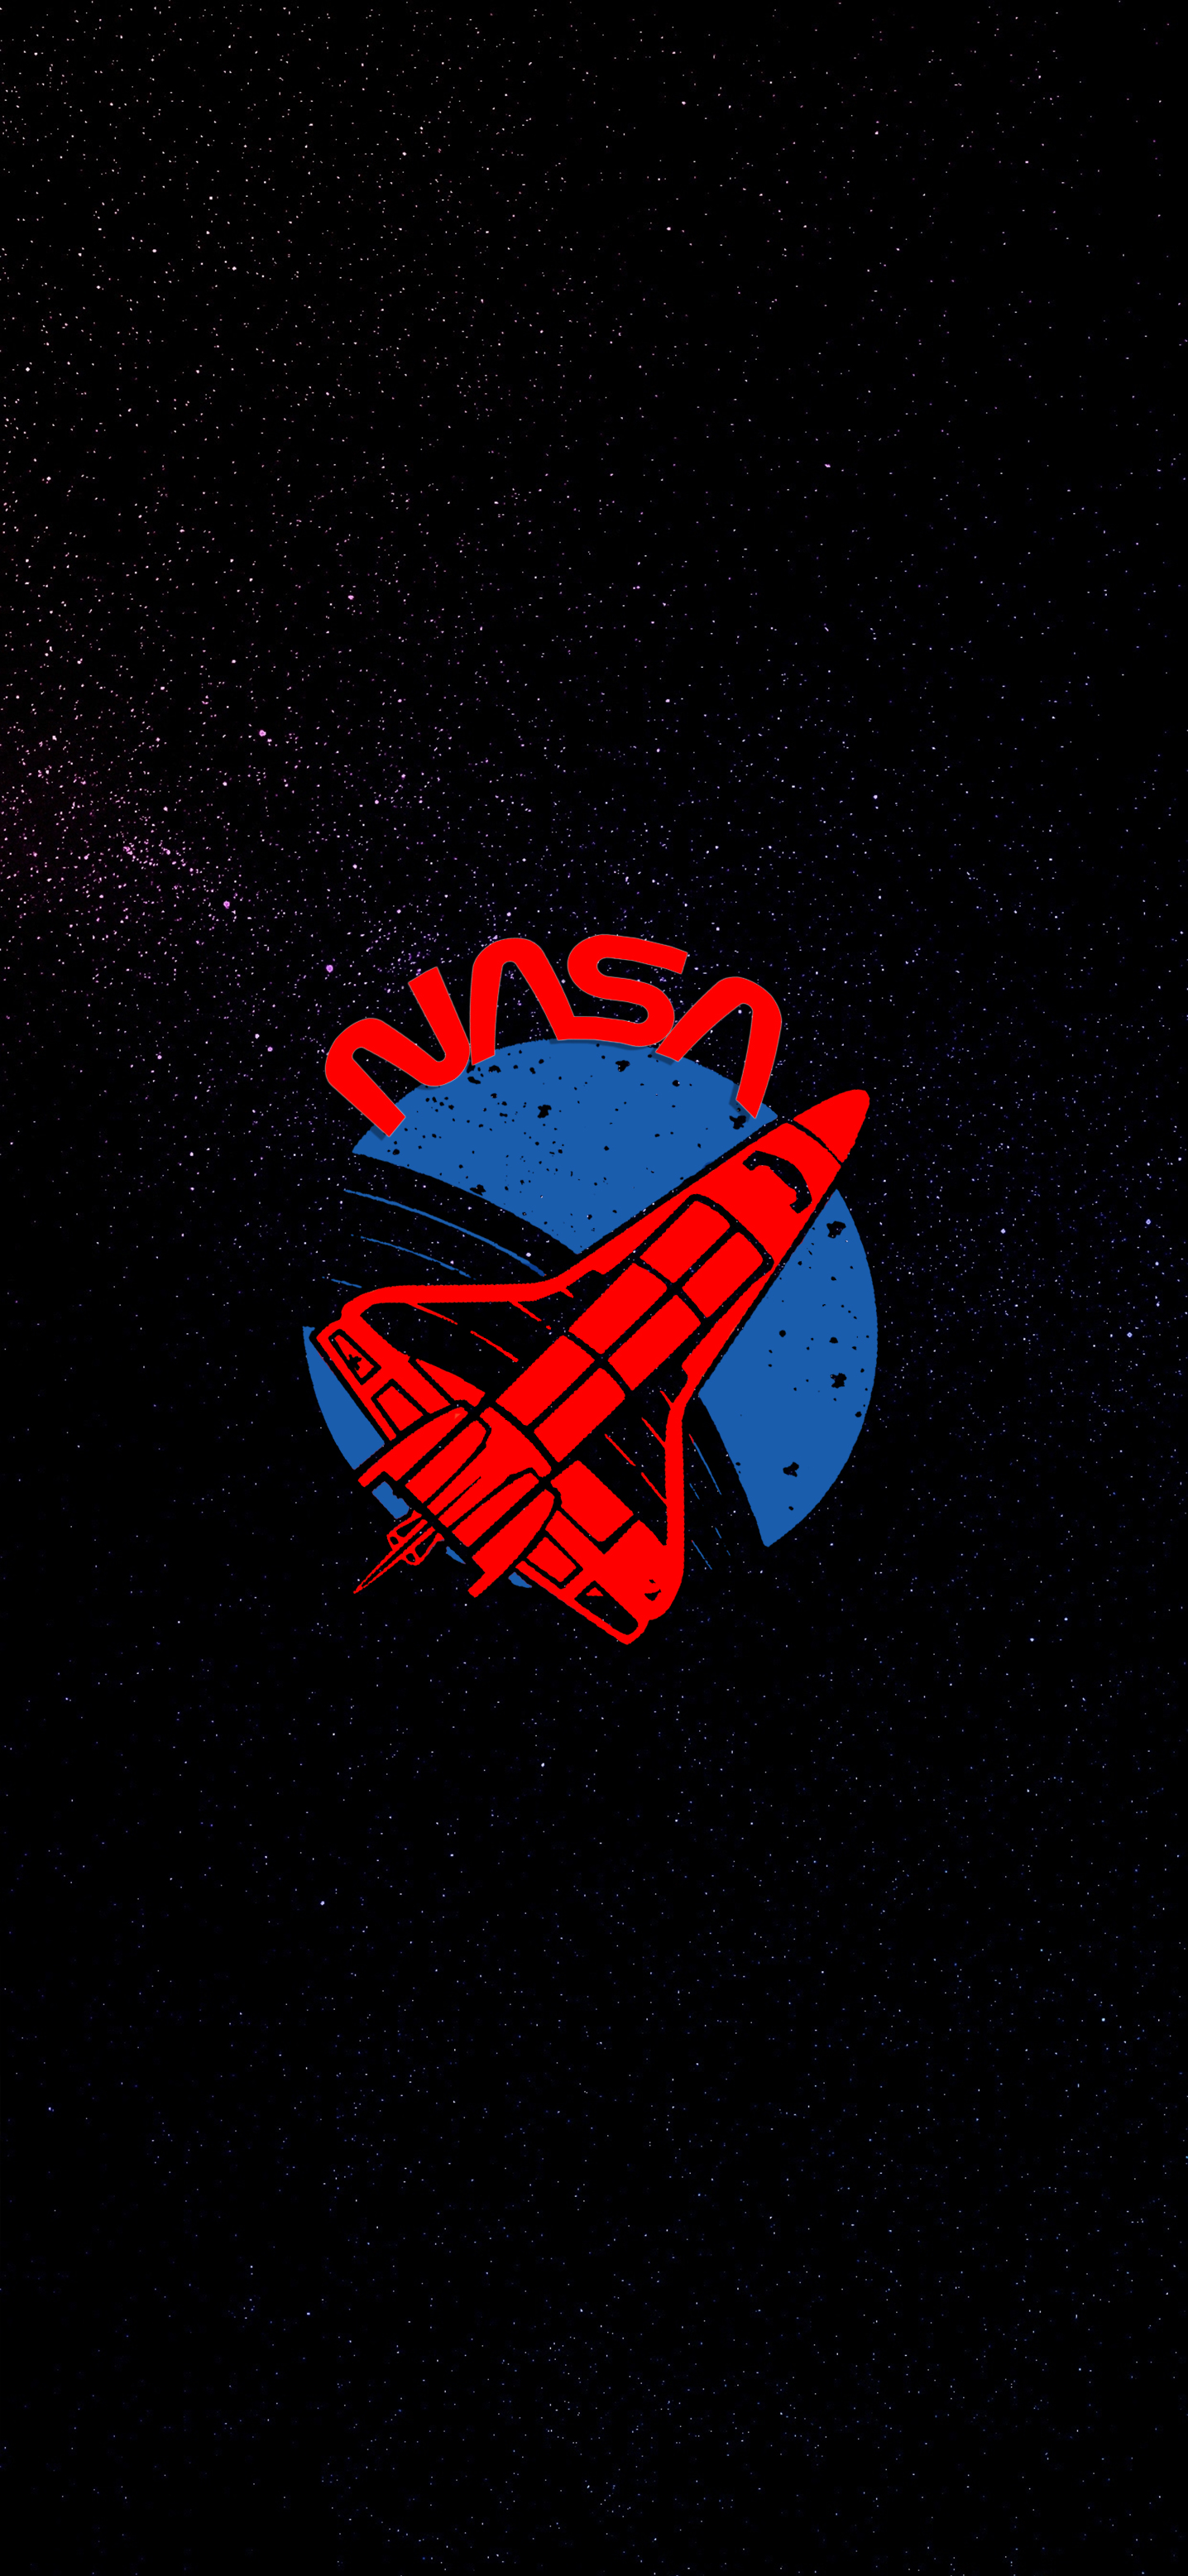 Nasa Logo IPhone X Wallpapers